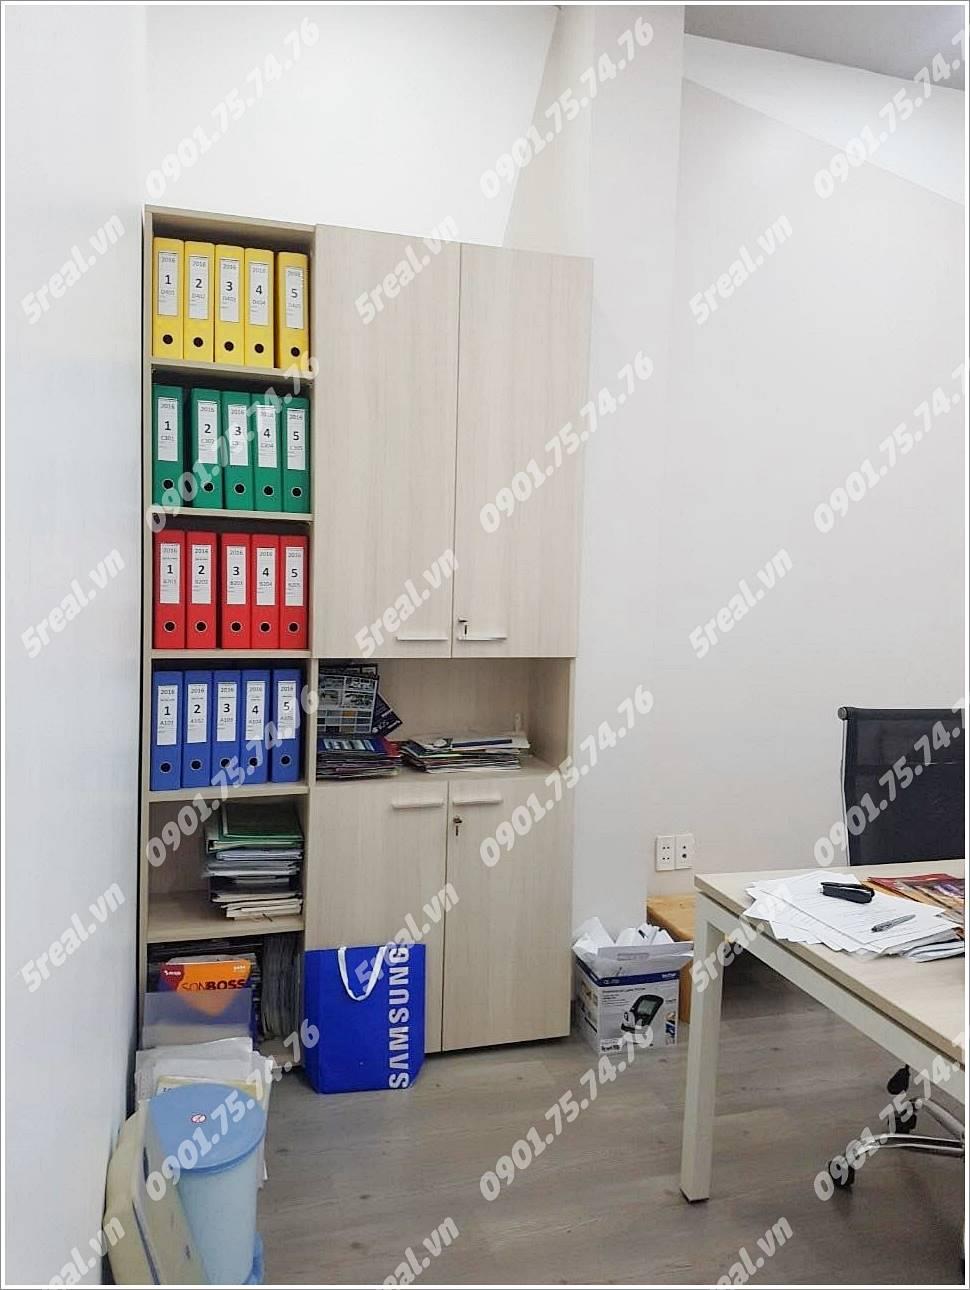 doo-building-nguyen-van-qua-quan-12-van-phong-cho-thue-5real.vn-03